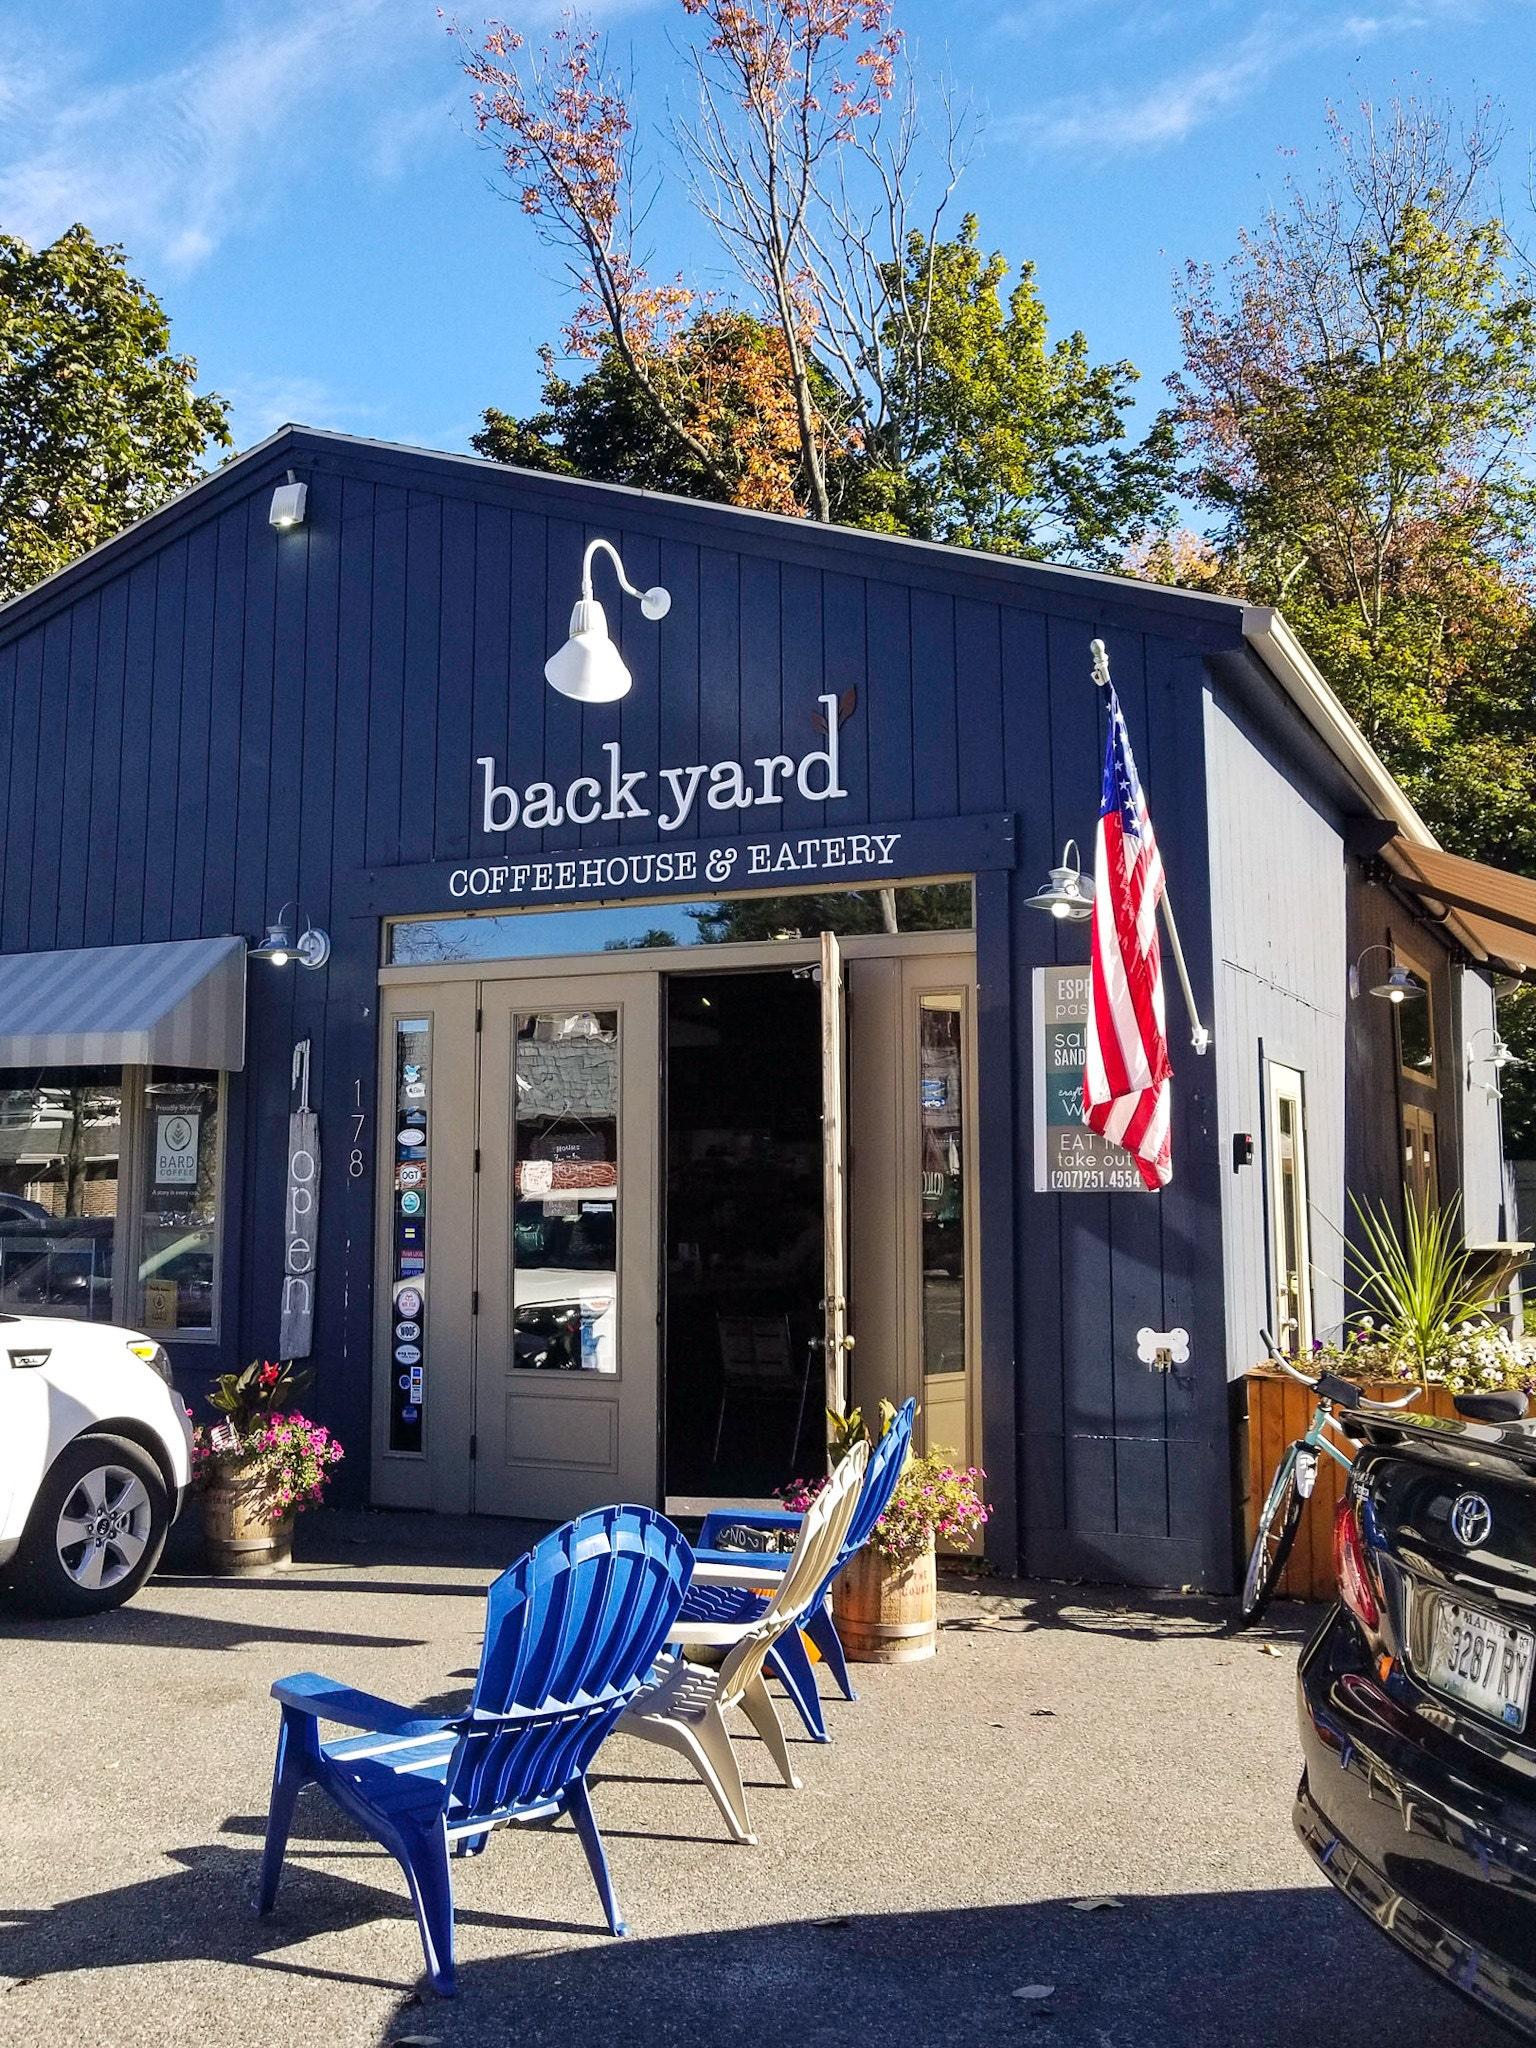 Backyard coffeehouse and eatery